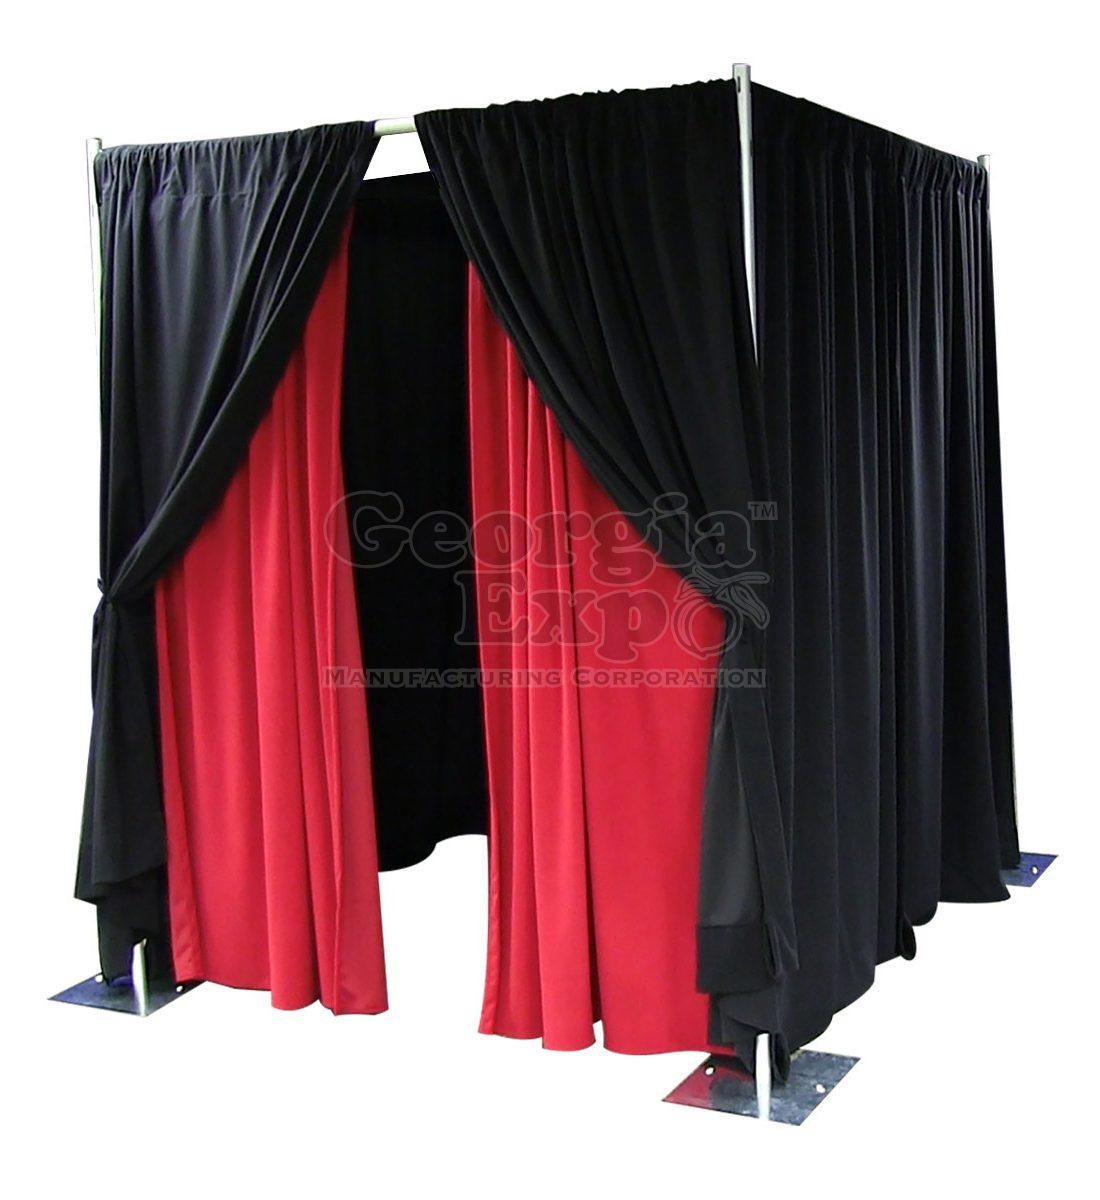 drapes kit pipe and drape amazon photo x camera studio backgrounds com backdrop dp white